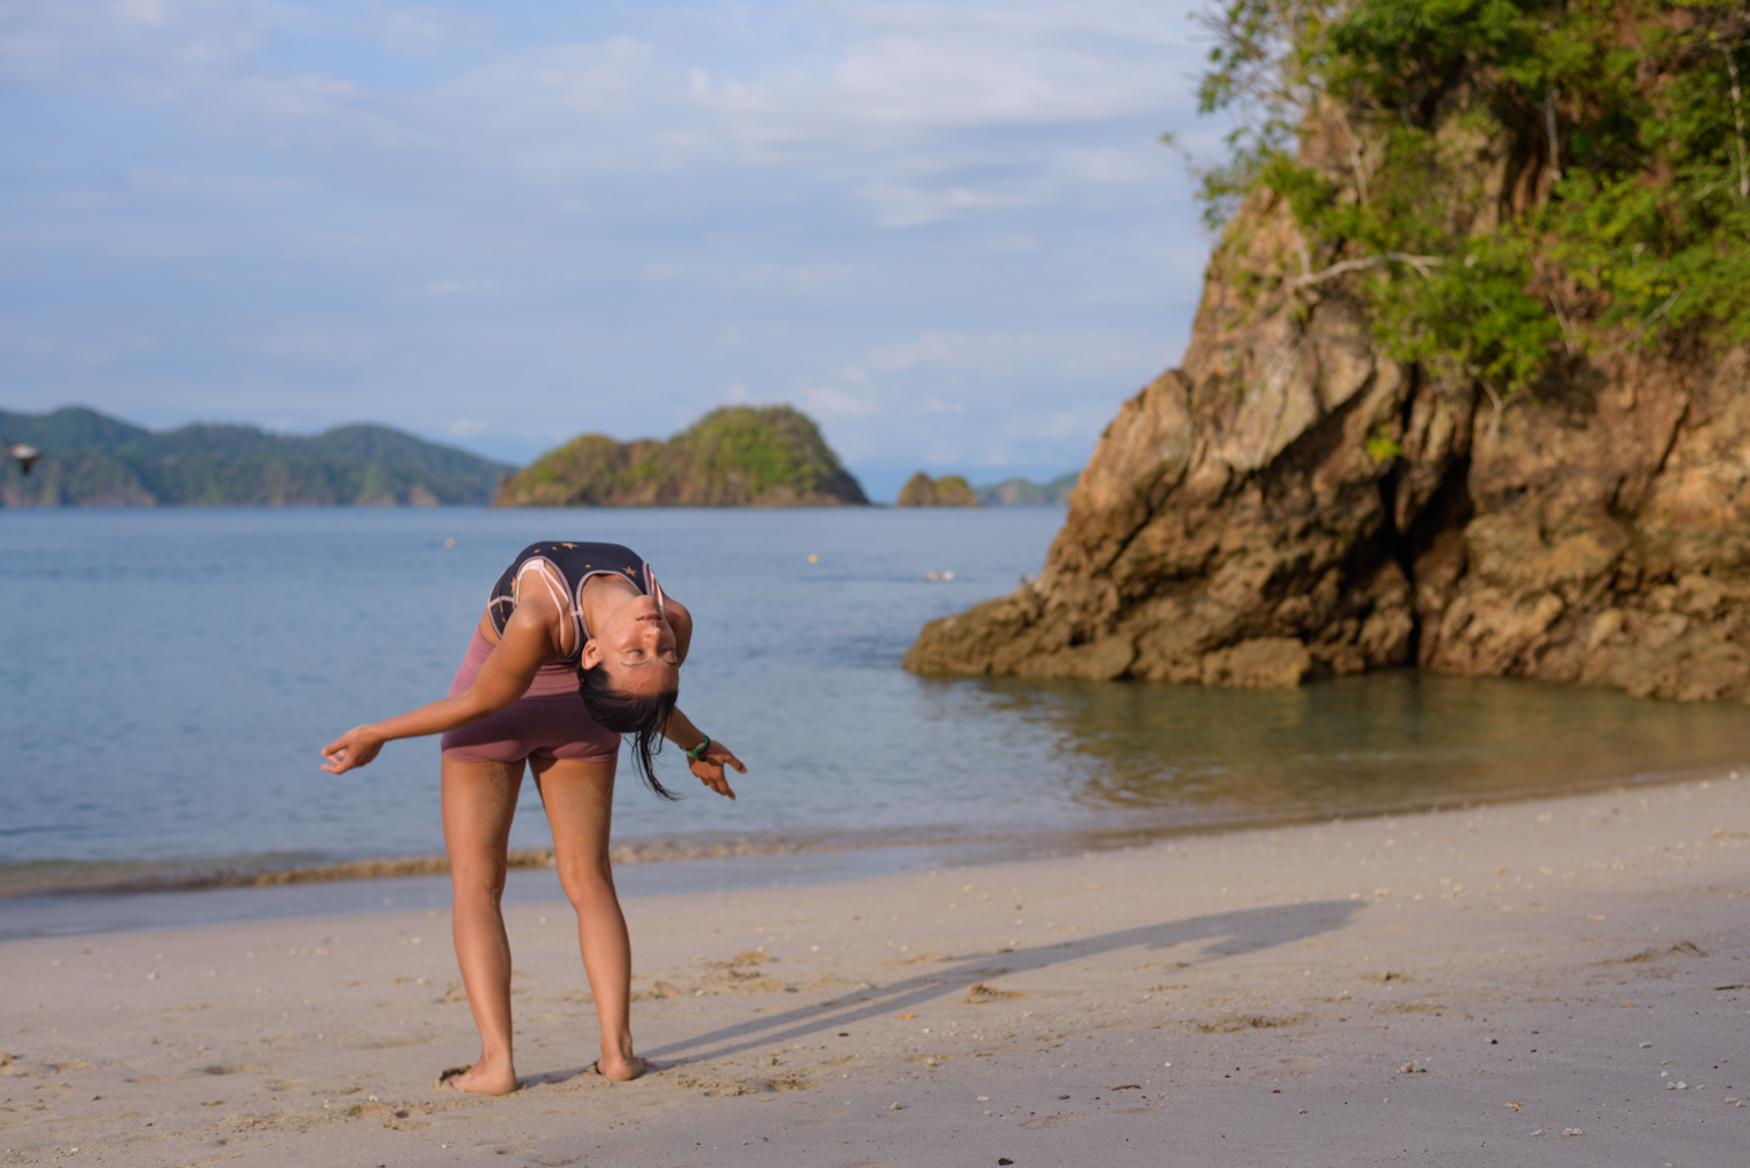 Yoga-Retreat-Photography-Costa-Rica-51.jpg